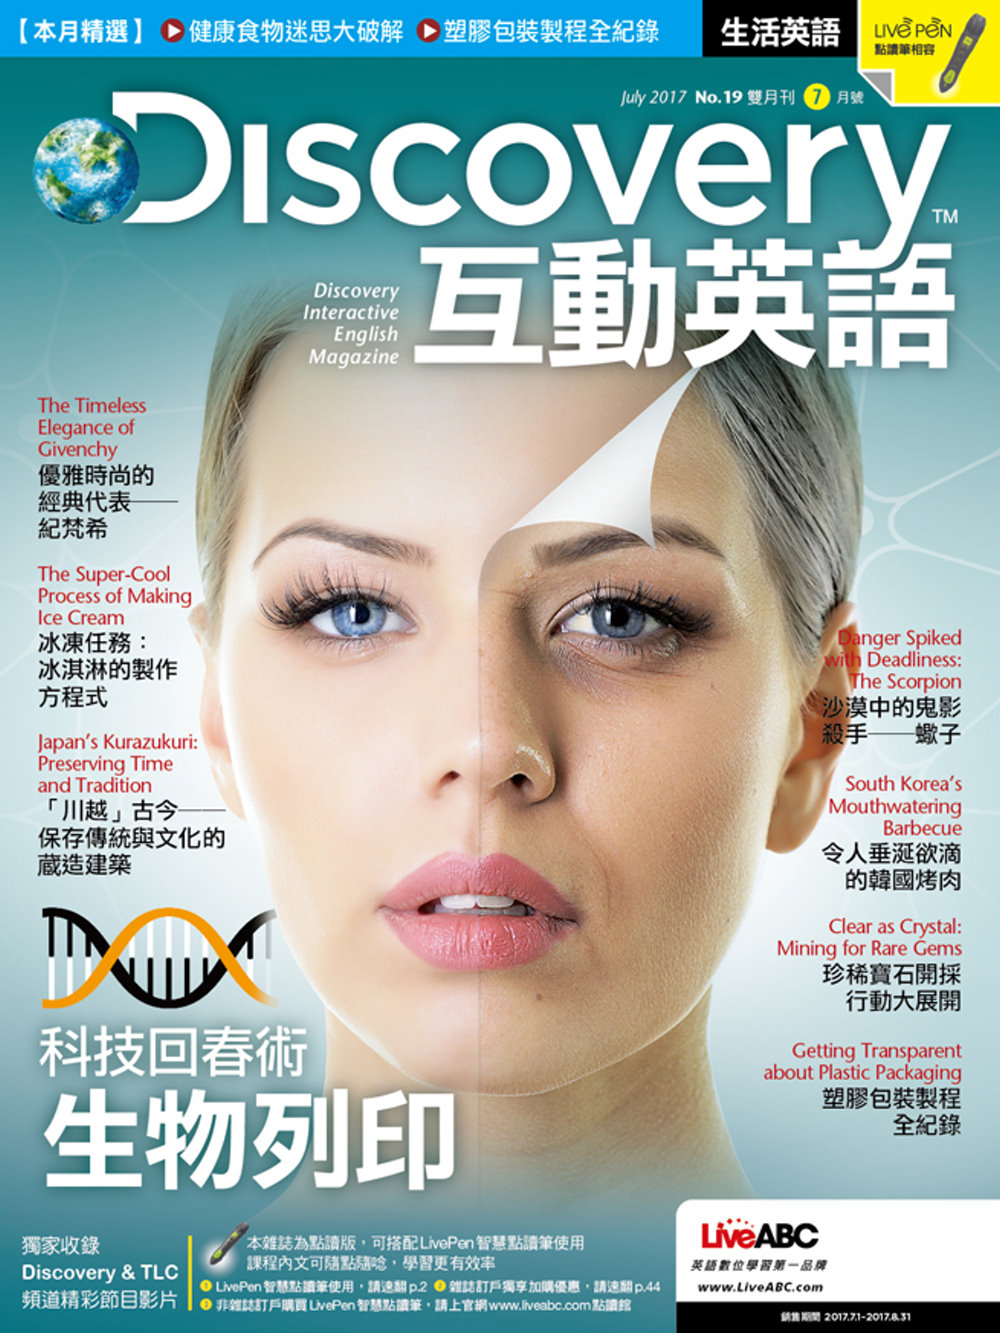 Discovery互動英語(課文朗讀版) 7月號/2017 第19期